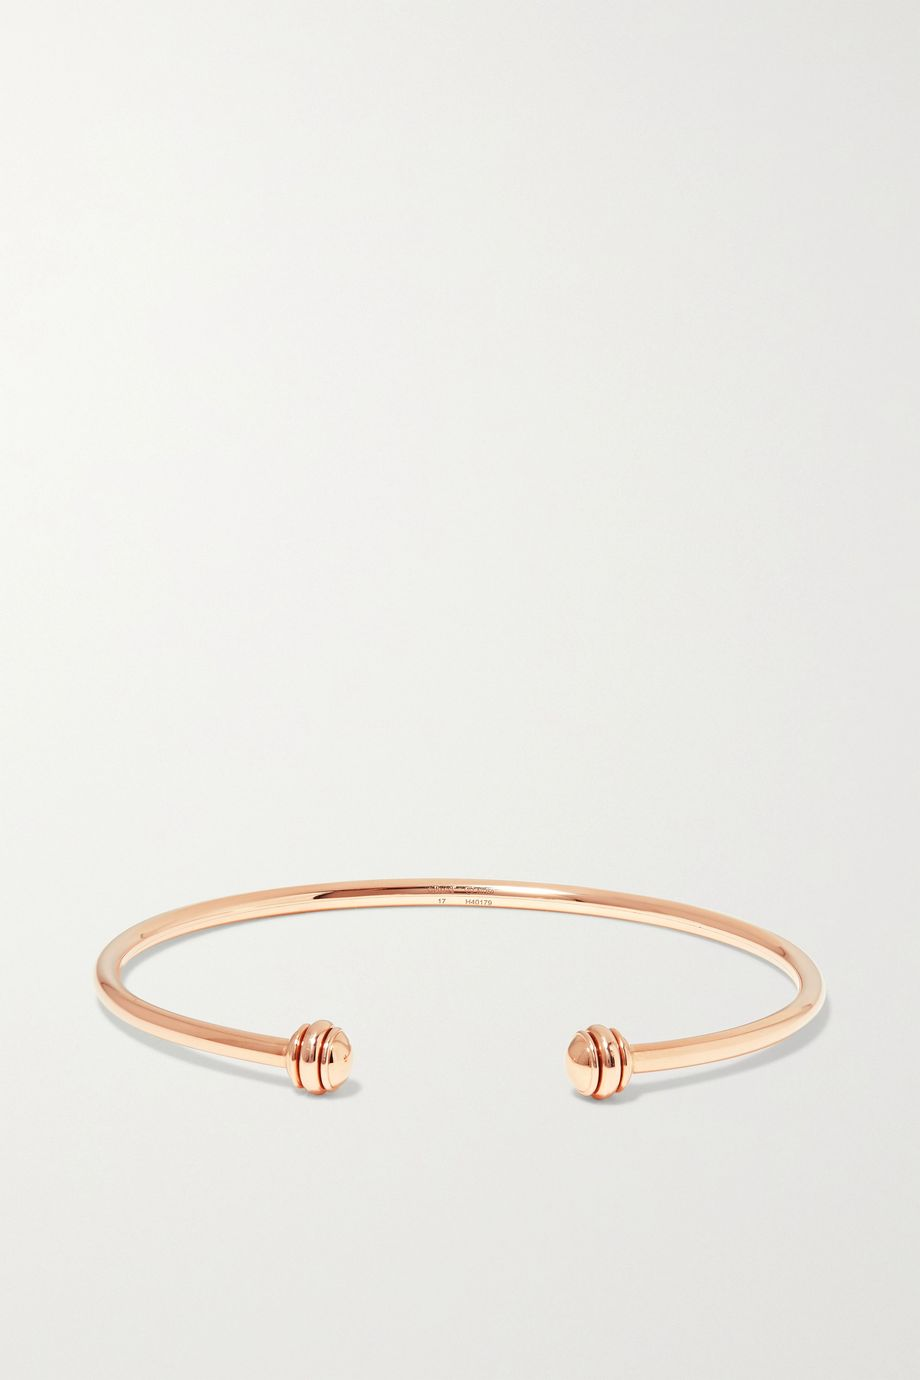 Piaget Possession 18-karat rose gold cuff